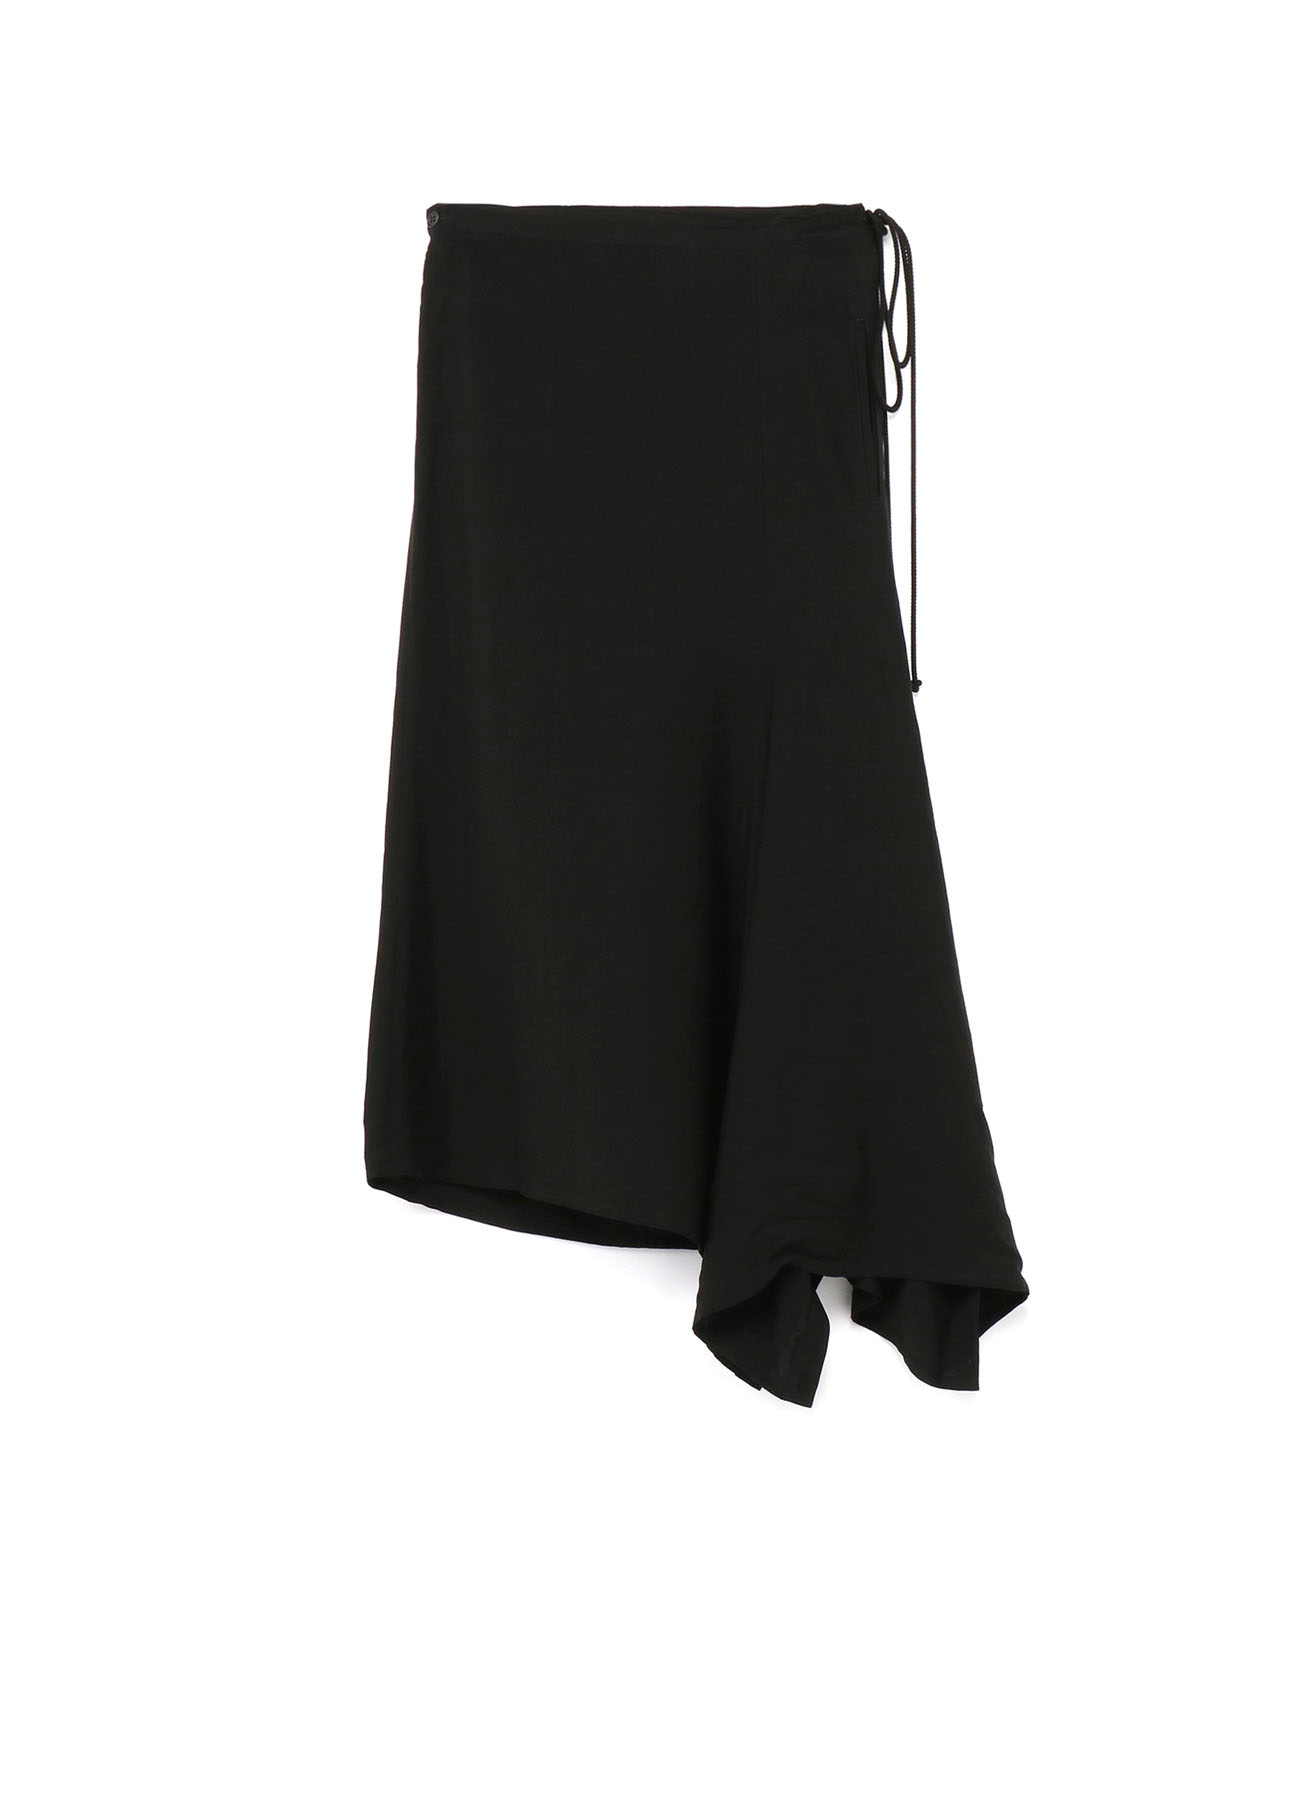 Ly/Cu Gabardine Side Gather Skirt